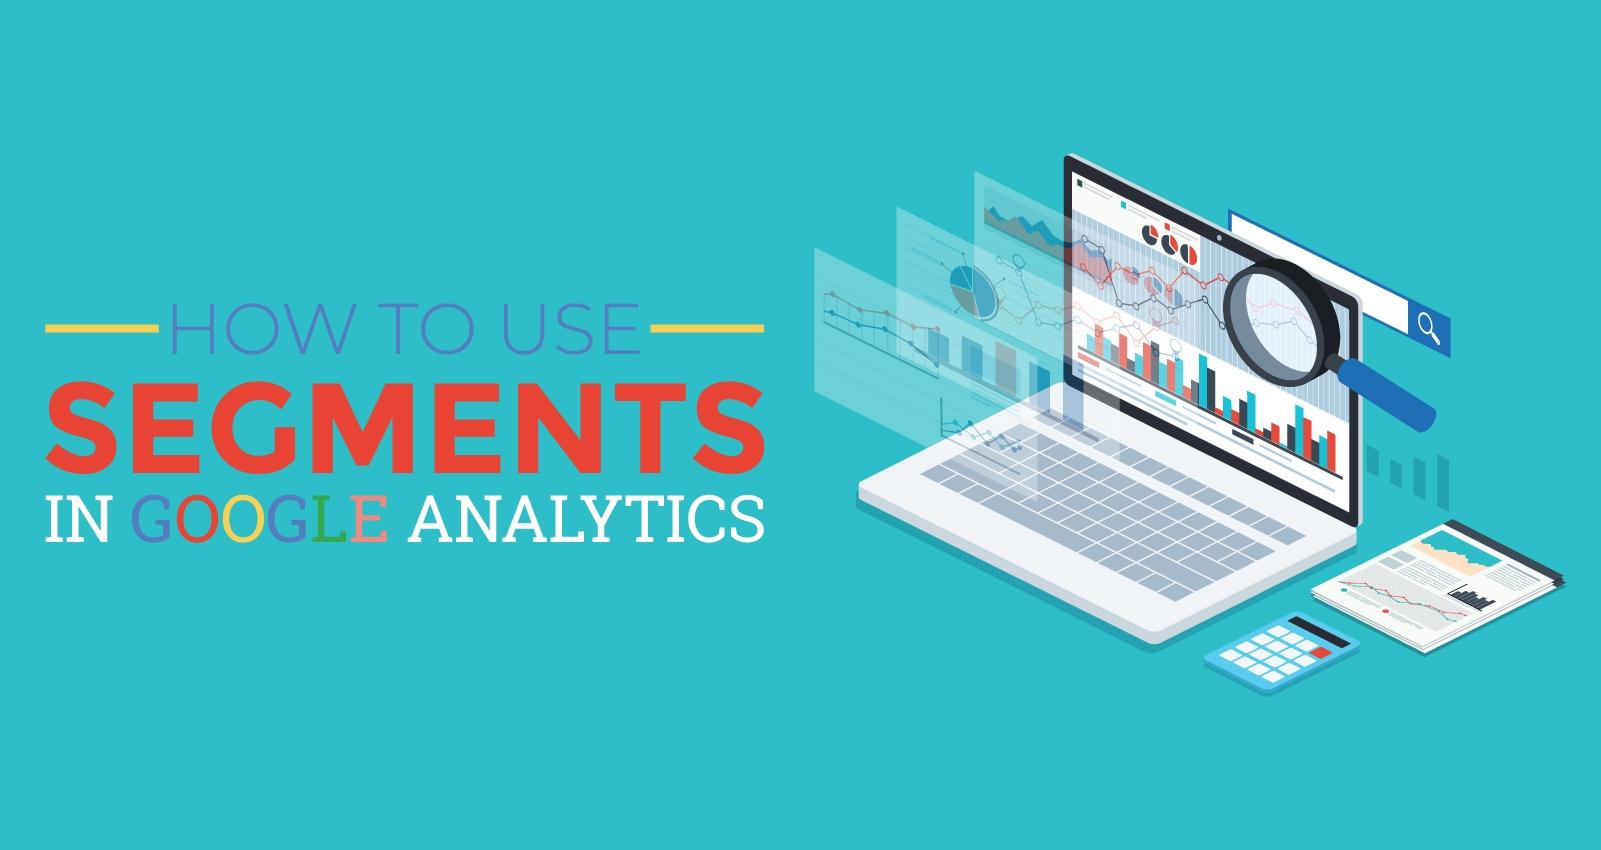 280204 How To Use Segments In Google Analytics 083018